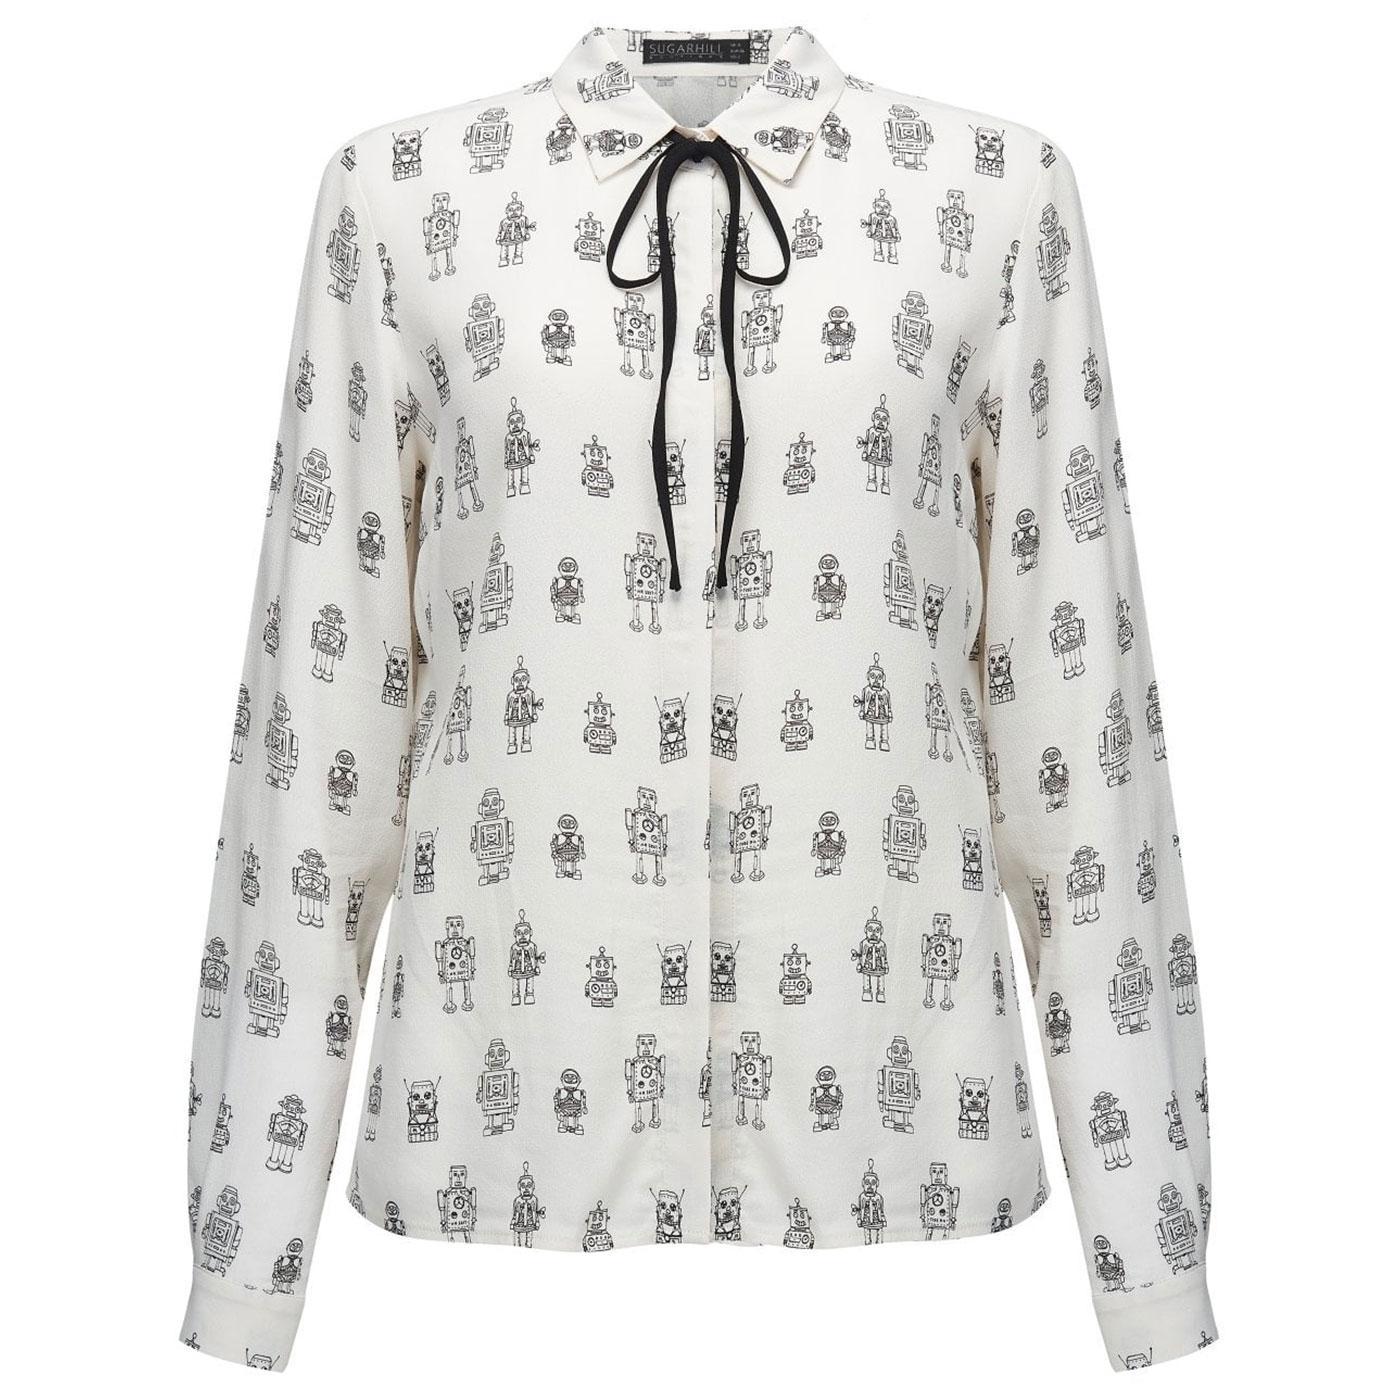 Catrina Robo Pop SUGARHILL BOUTIQUE 50s Shirt O/W